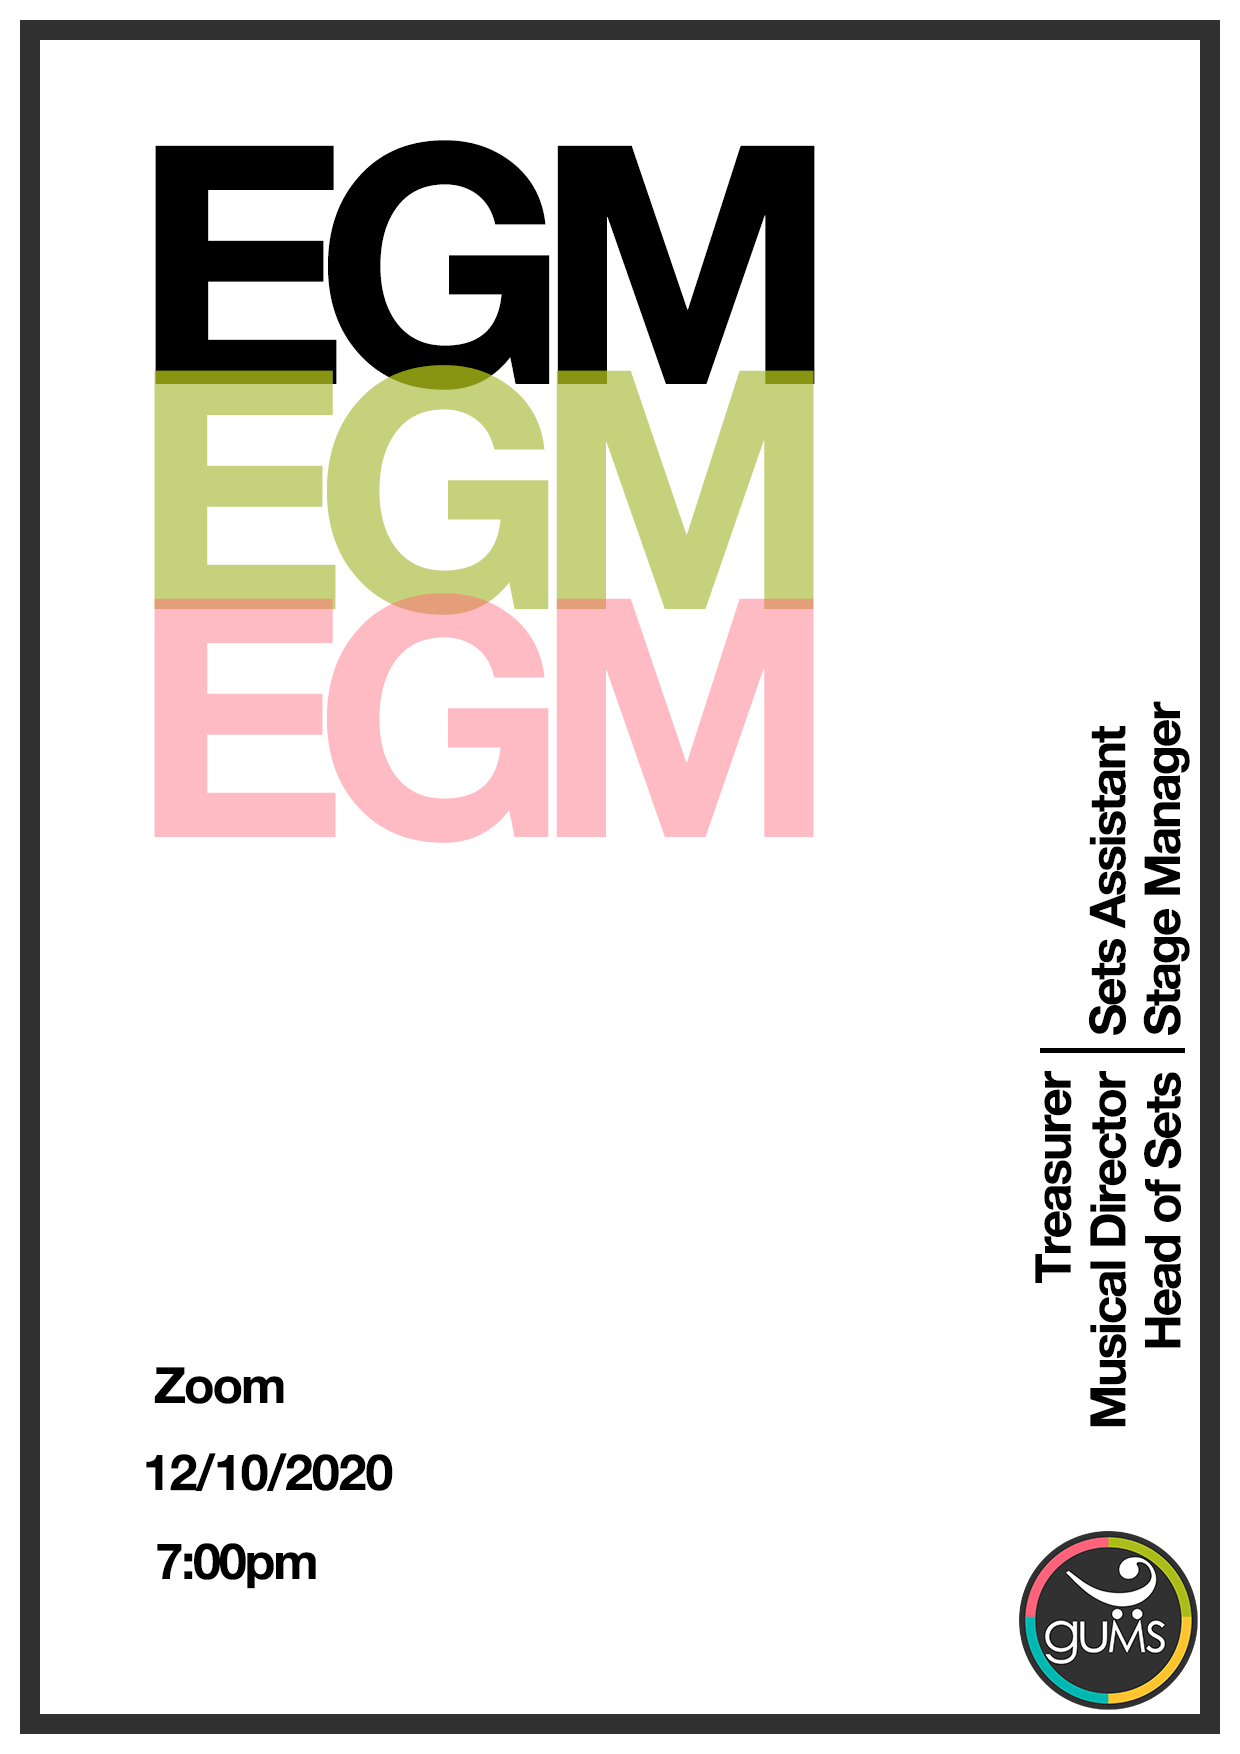 EGM Poster